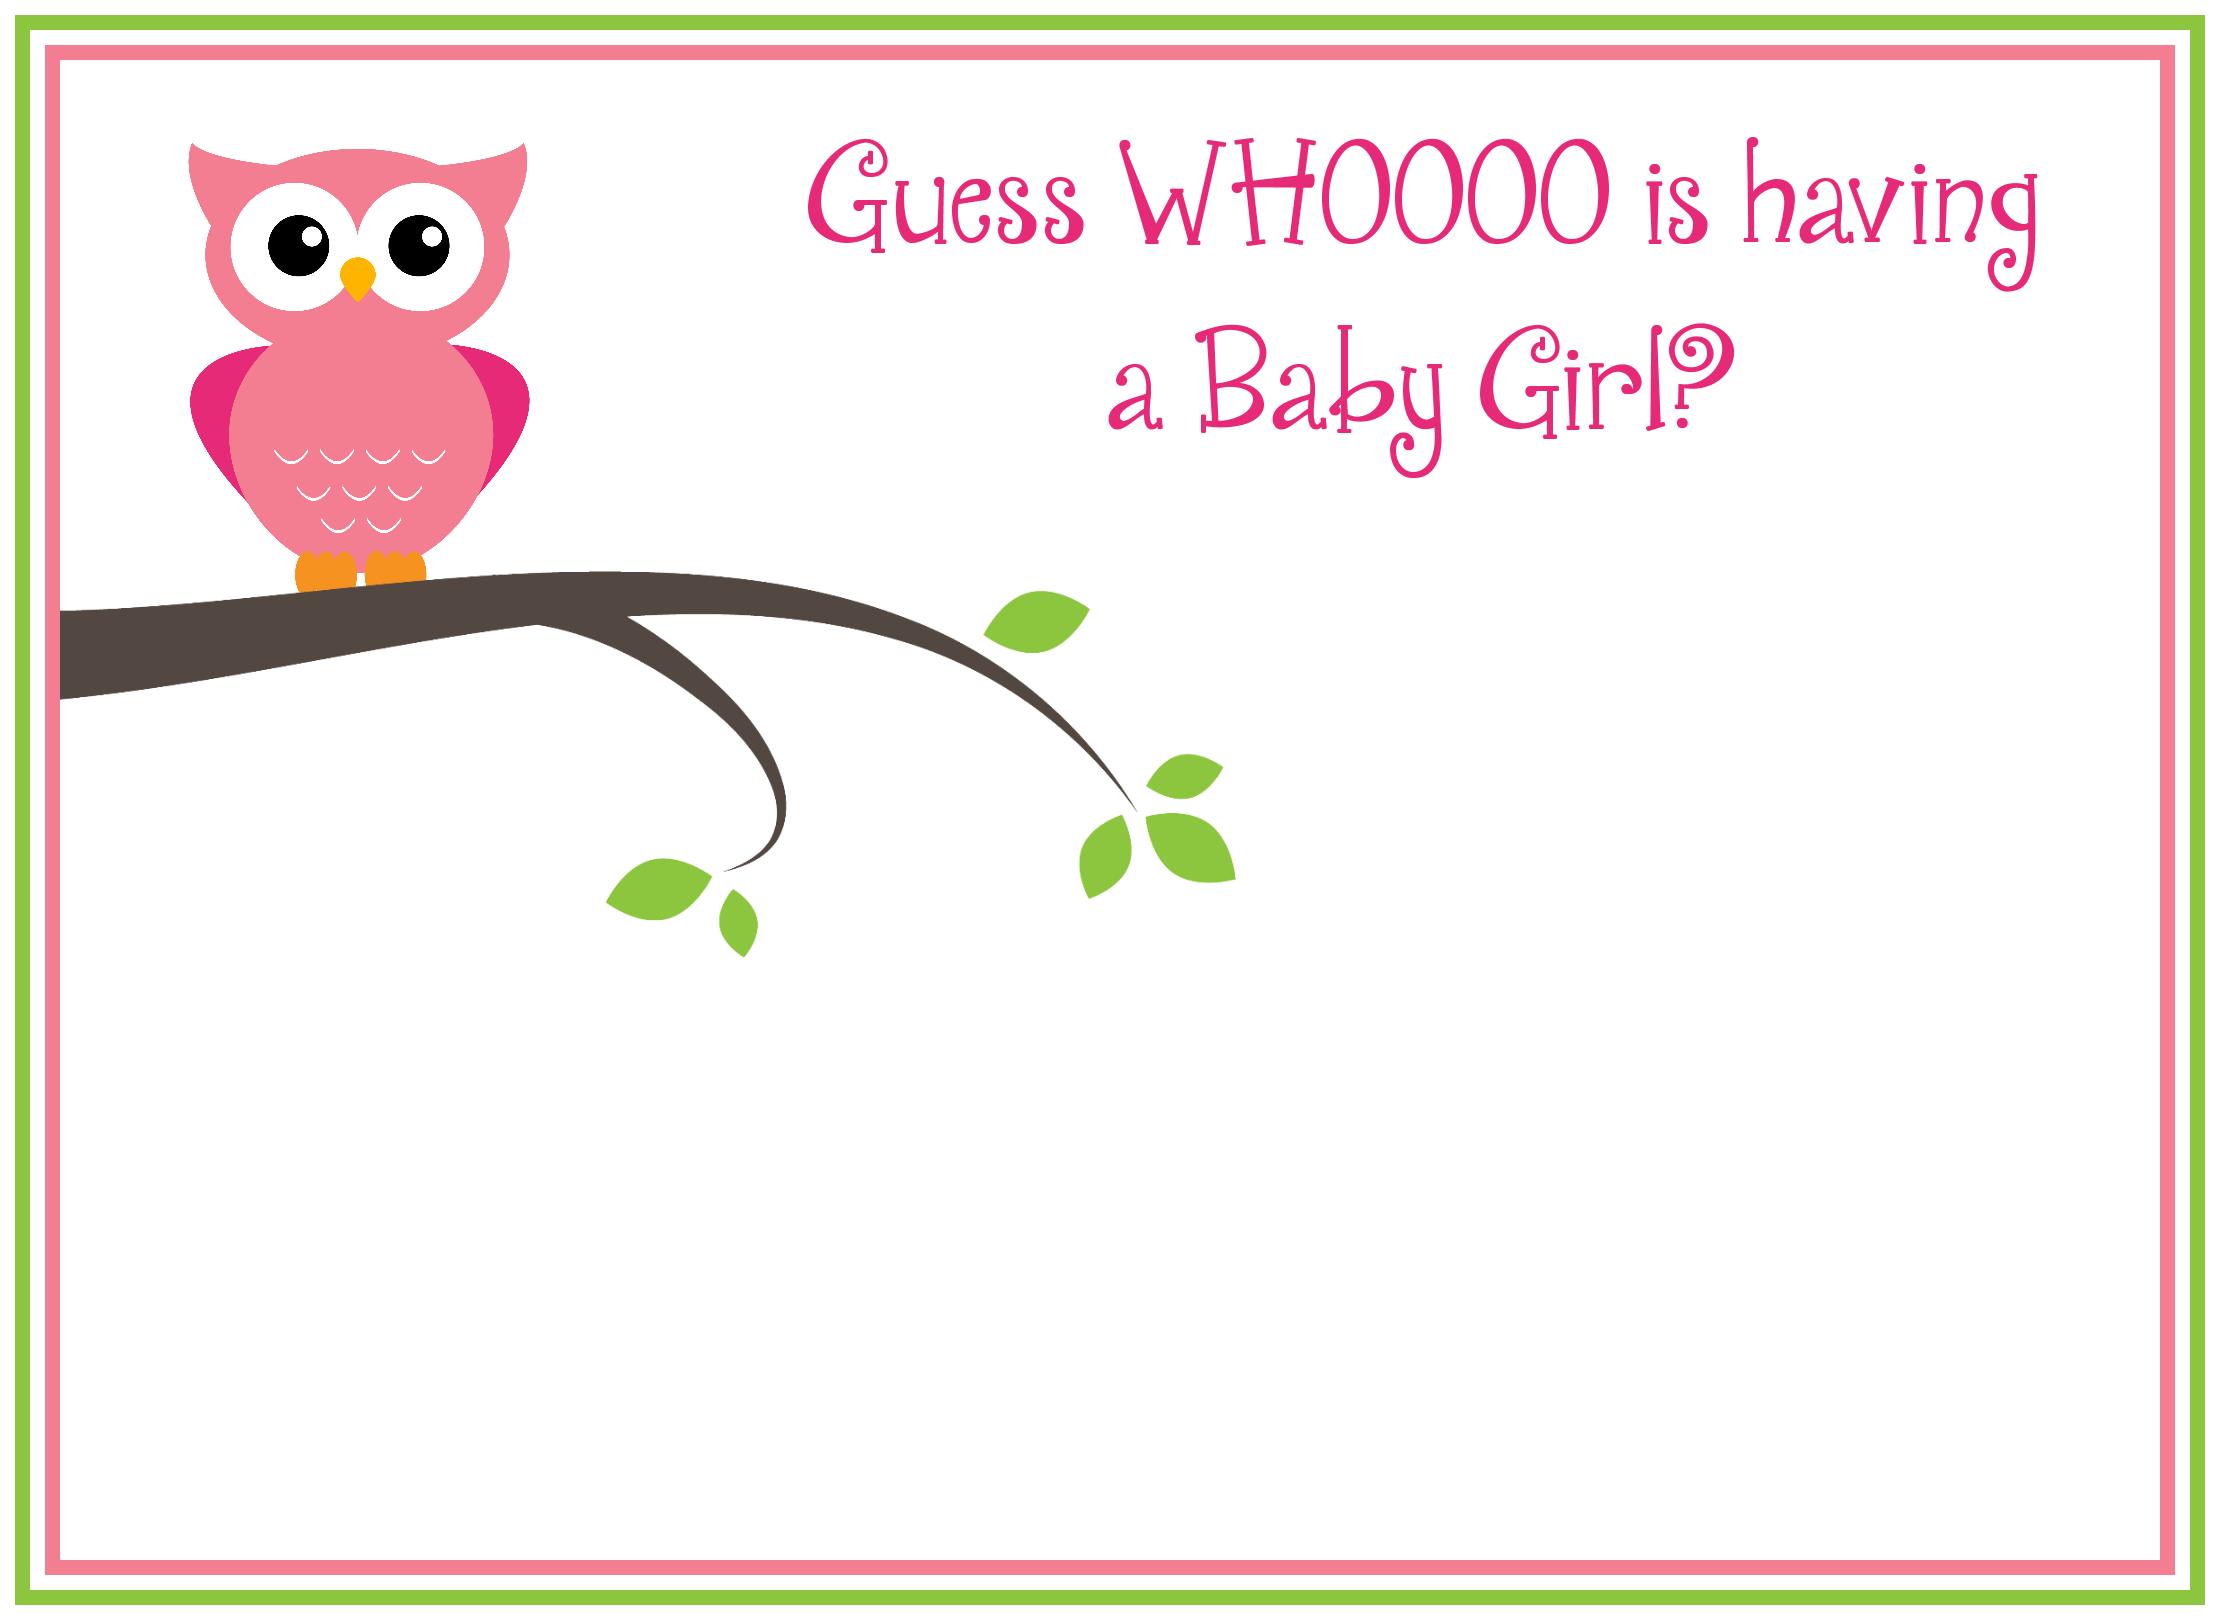 Free Printable Owl Baby Shower Invitations Other Printables Owl Baby Shower Invitations Free Baby Shower Invitations Baby Shower Invites For Girl